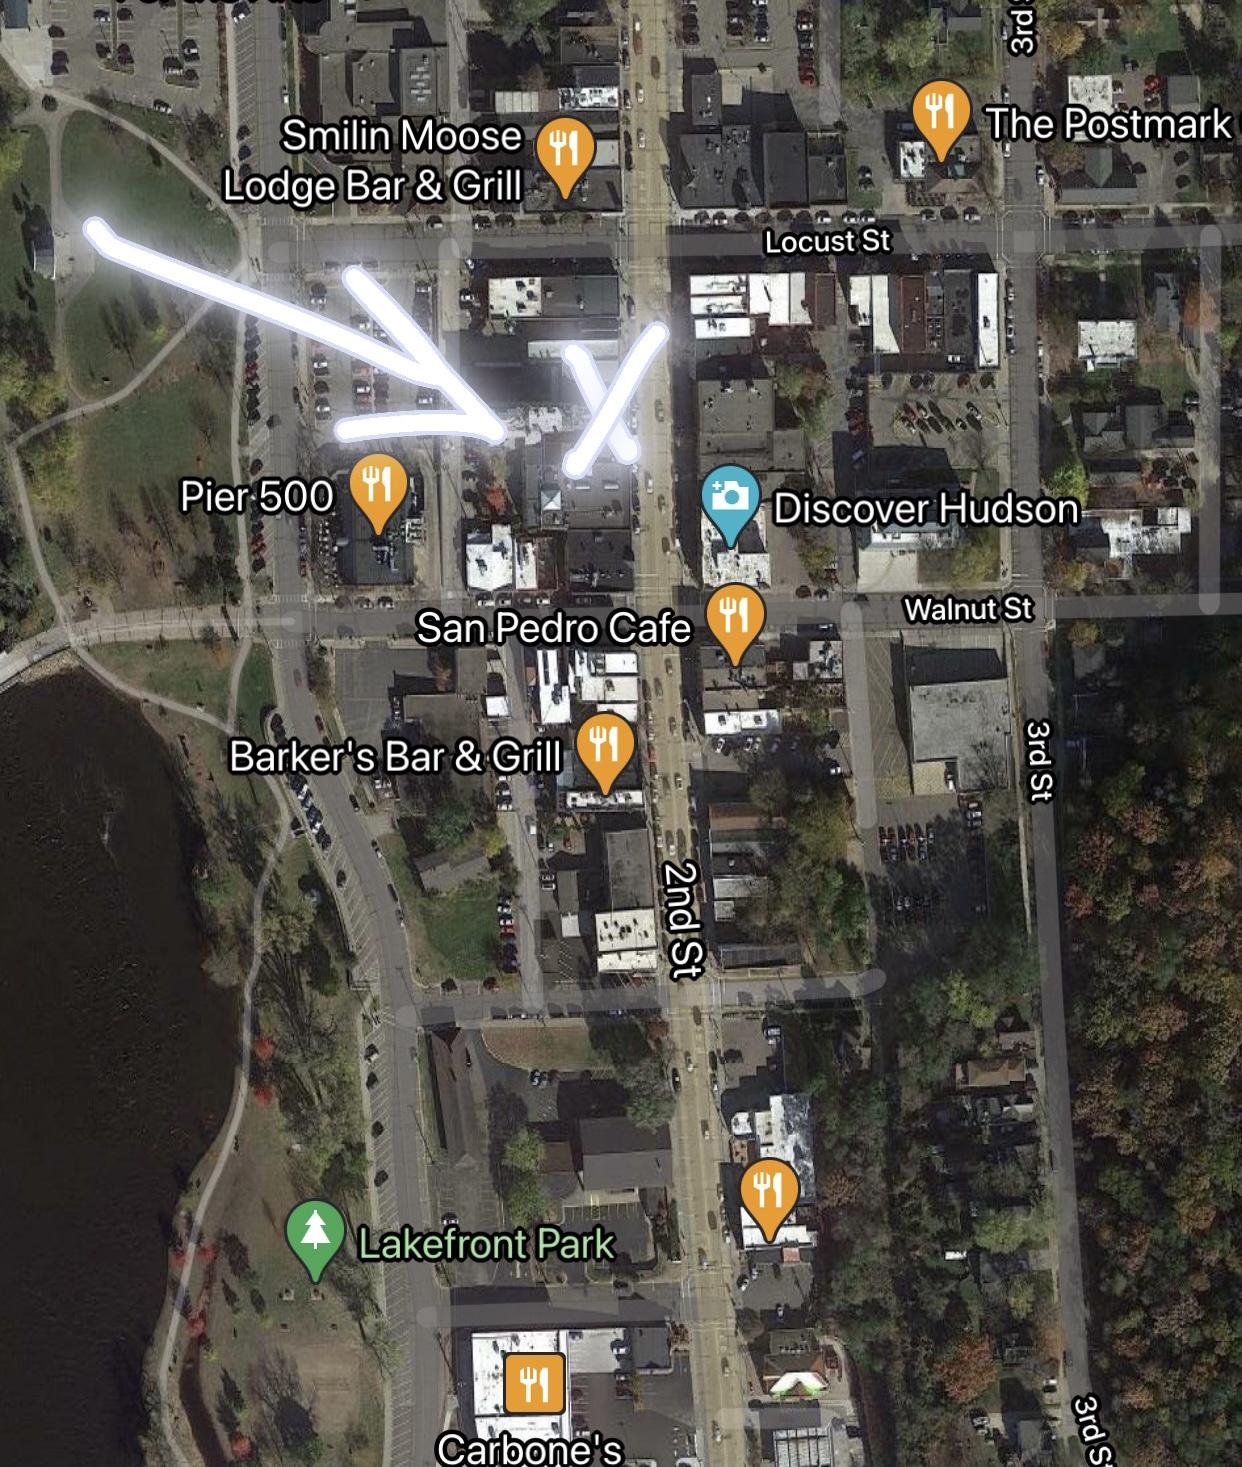 Location- Hudson